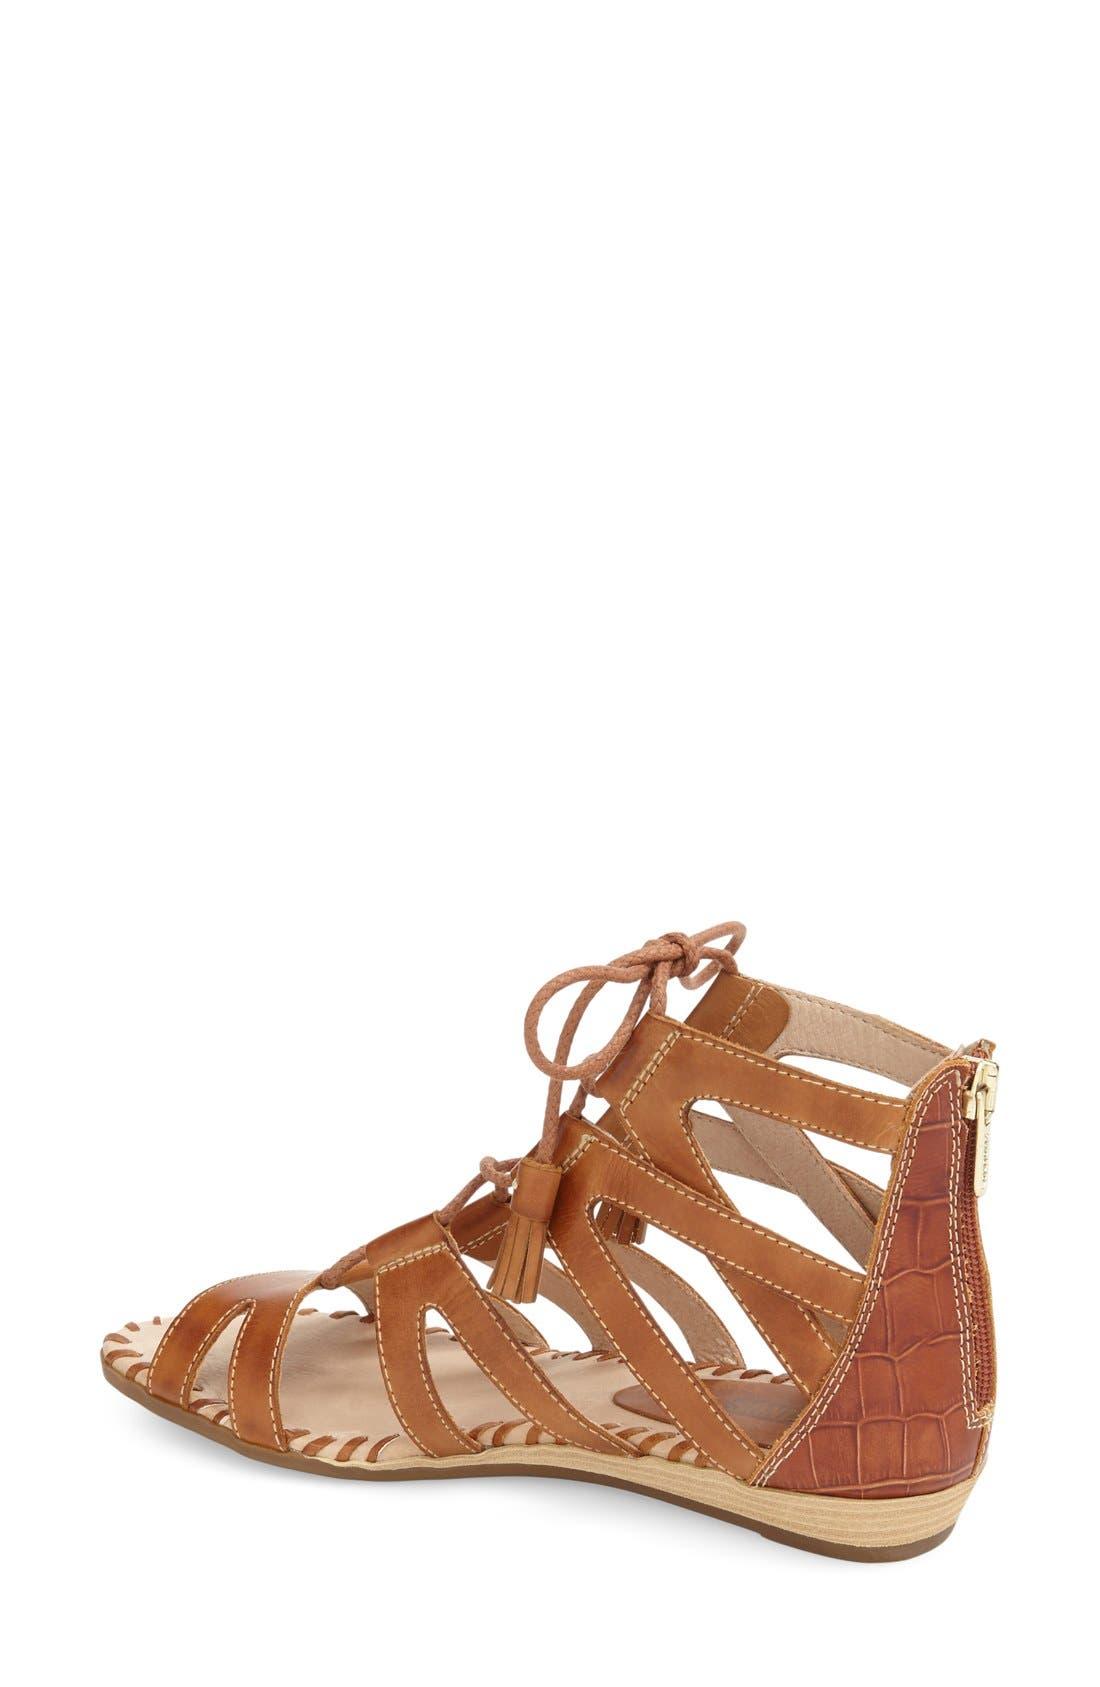 'Alcudia' Lace-Up Sandal,                             Alternate thumbnail 8, color,